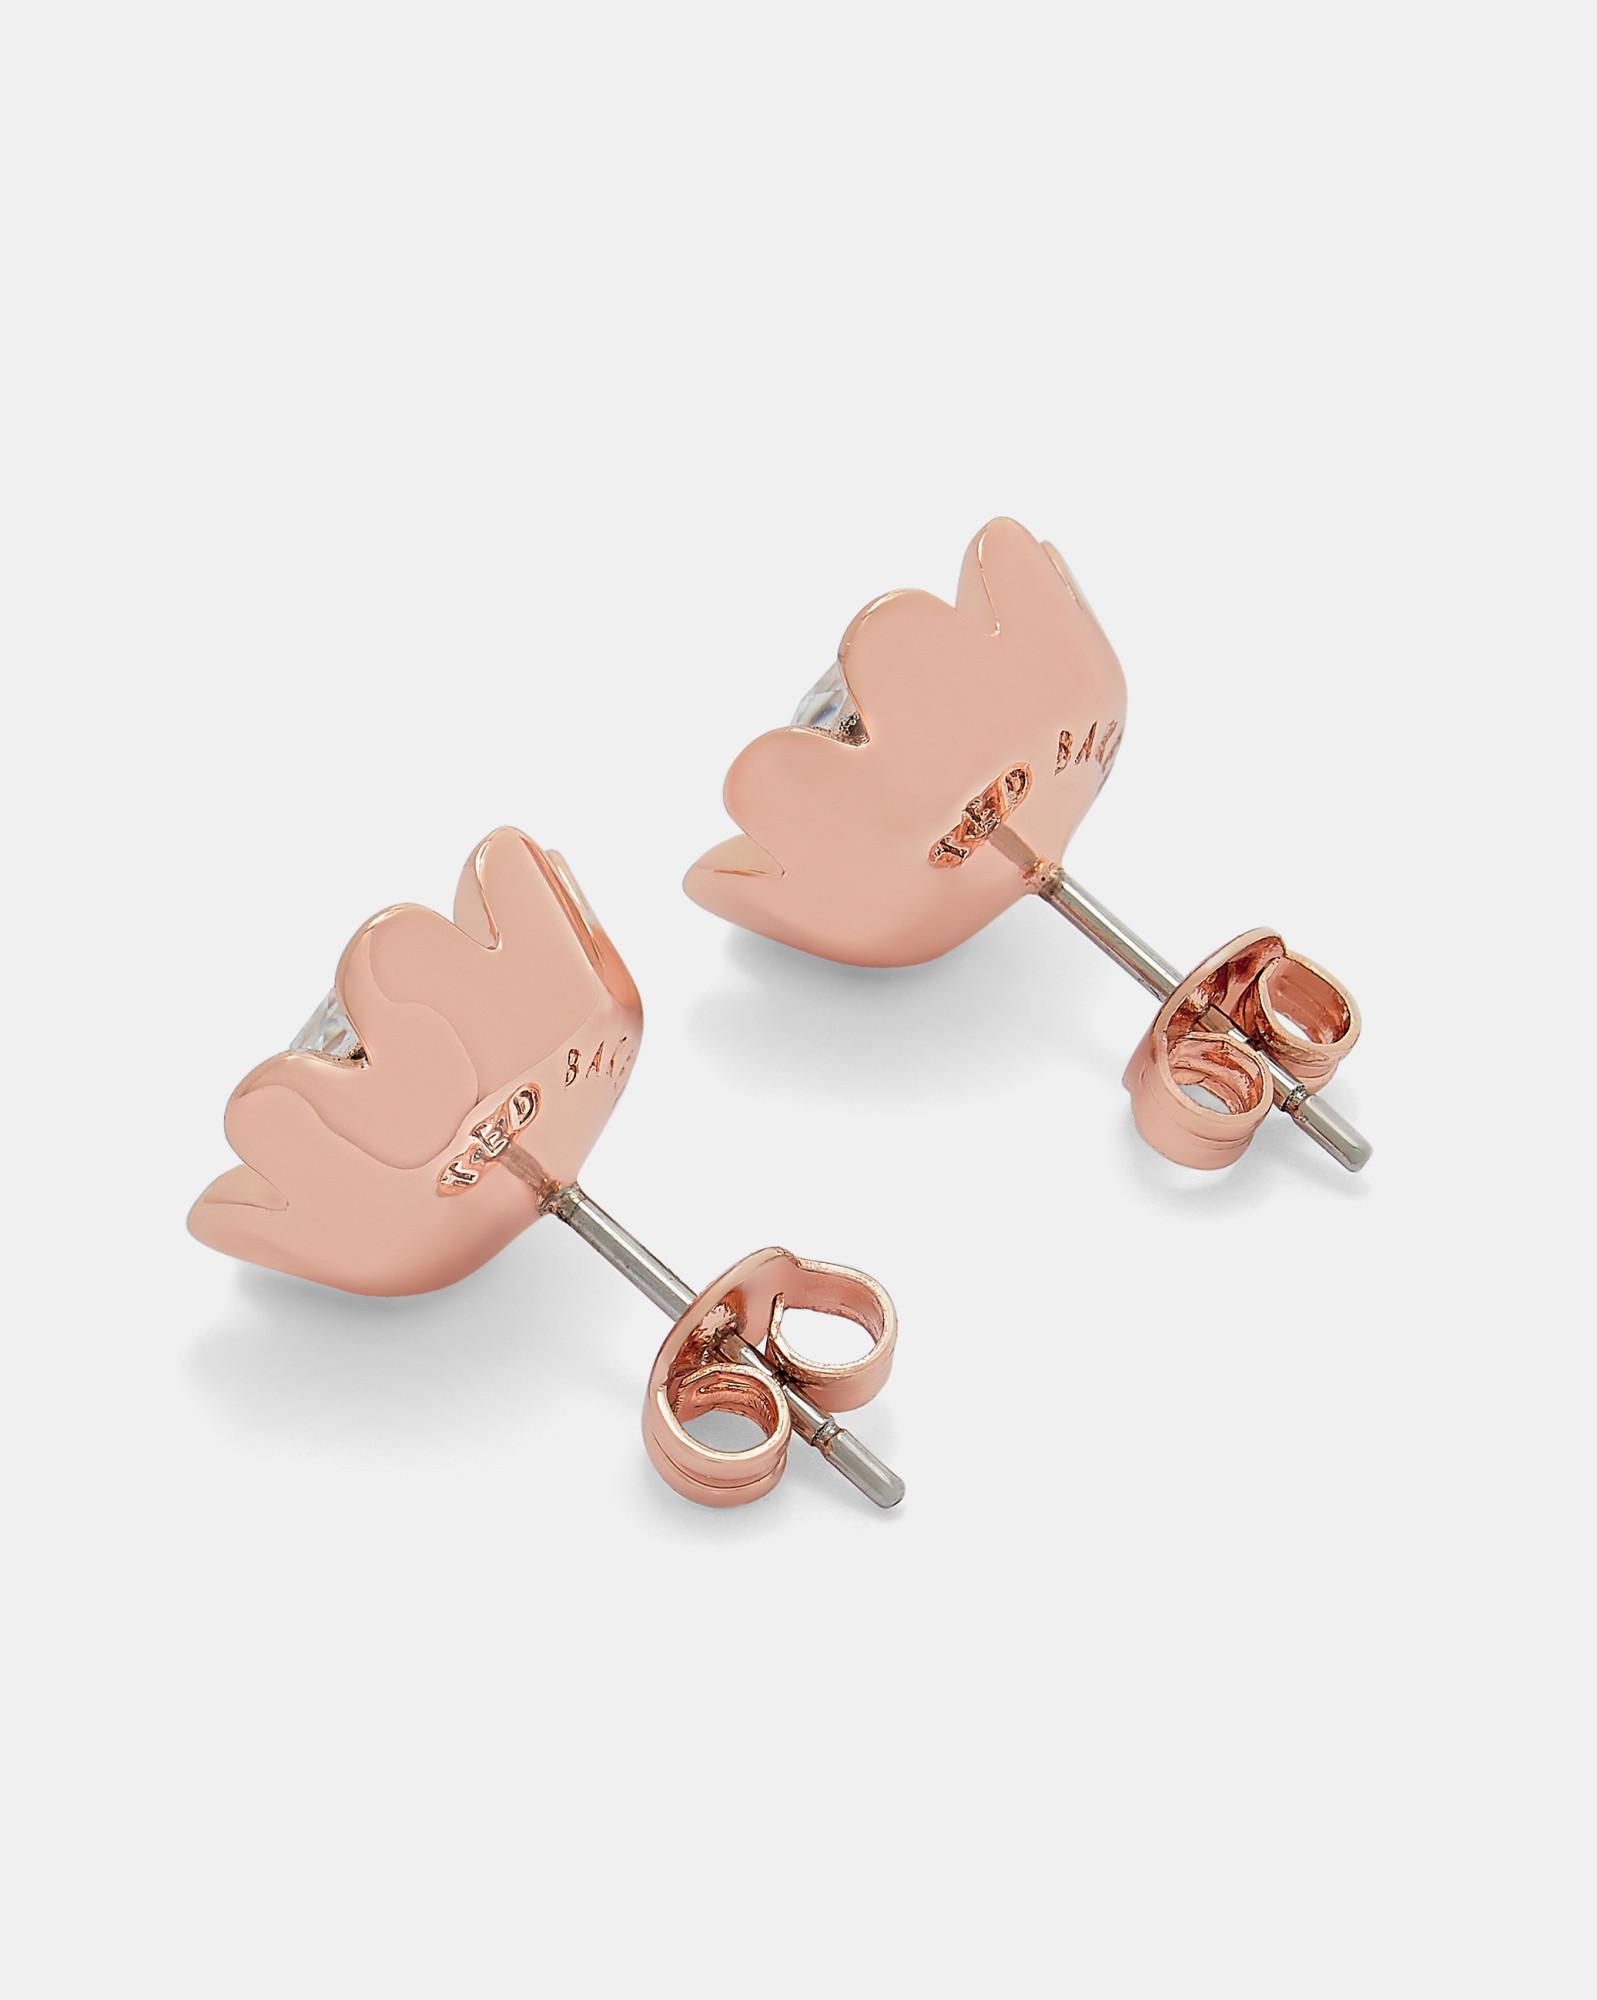 65b1ad3e1 Lyst - Ted Baker Magnolia Stud Earrings